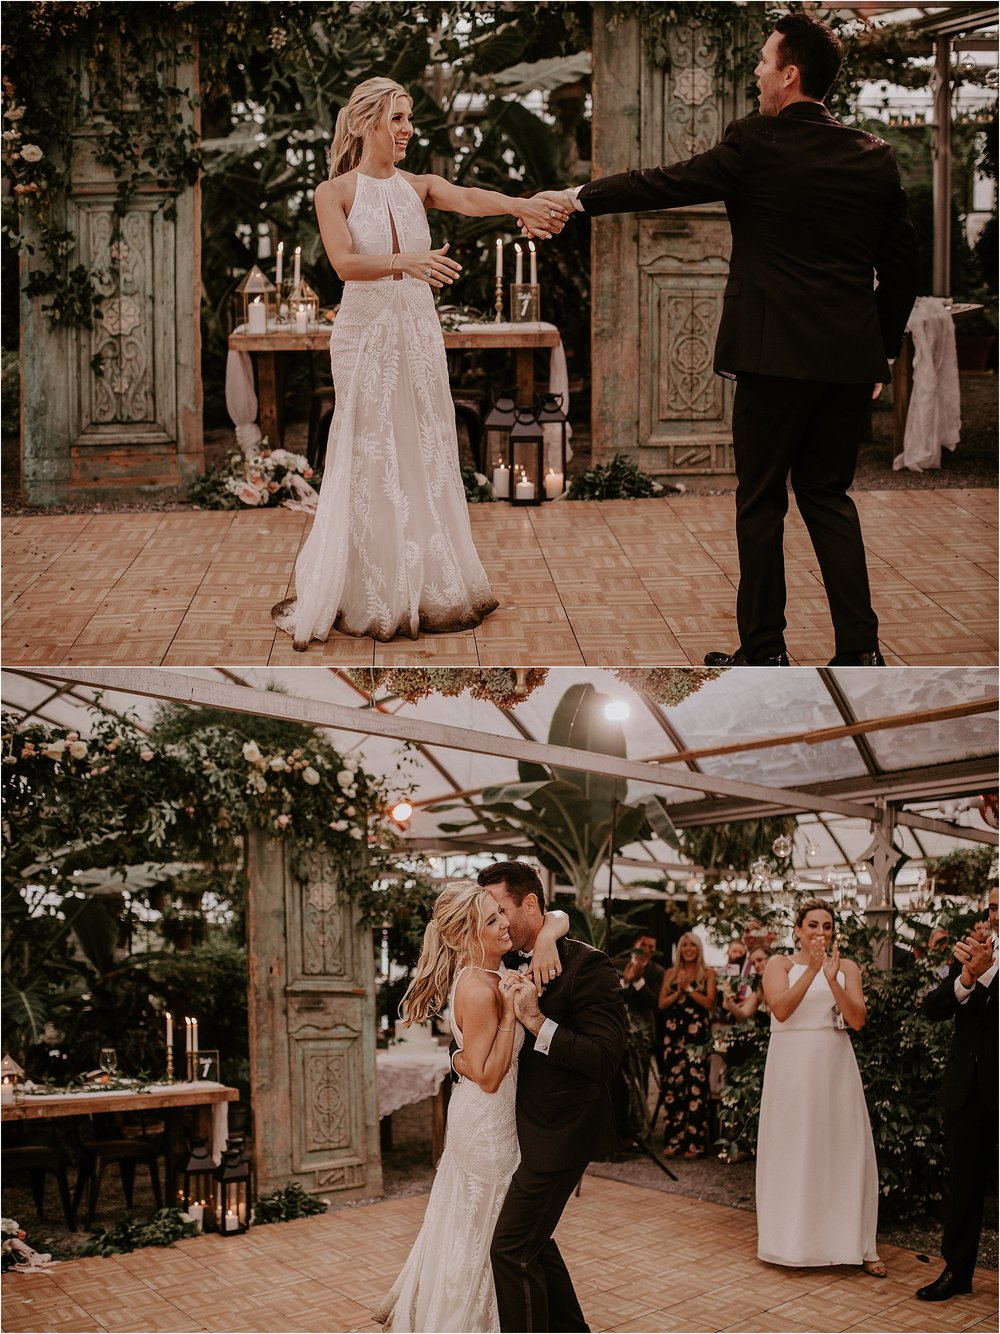 Sarah_Brookhart_Hortulus_Farm_Garden_and_Nursey_Wedding_Photographer_0066.jpg